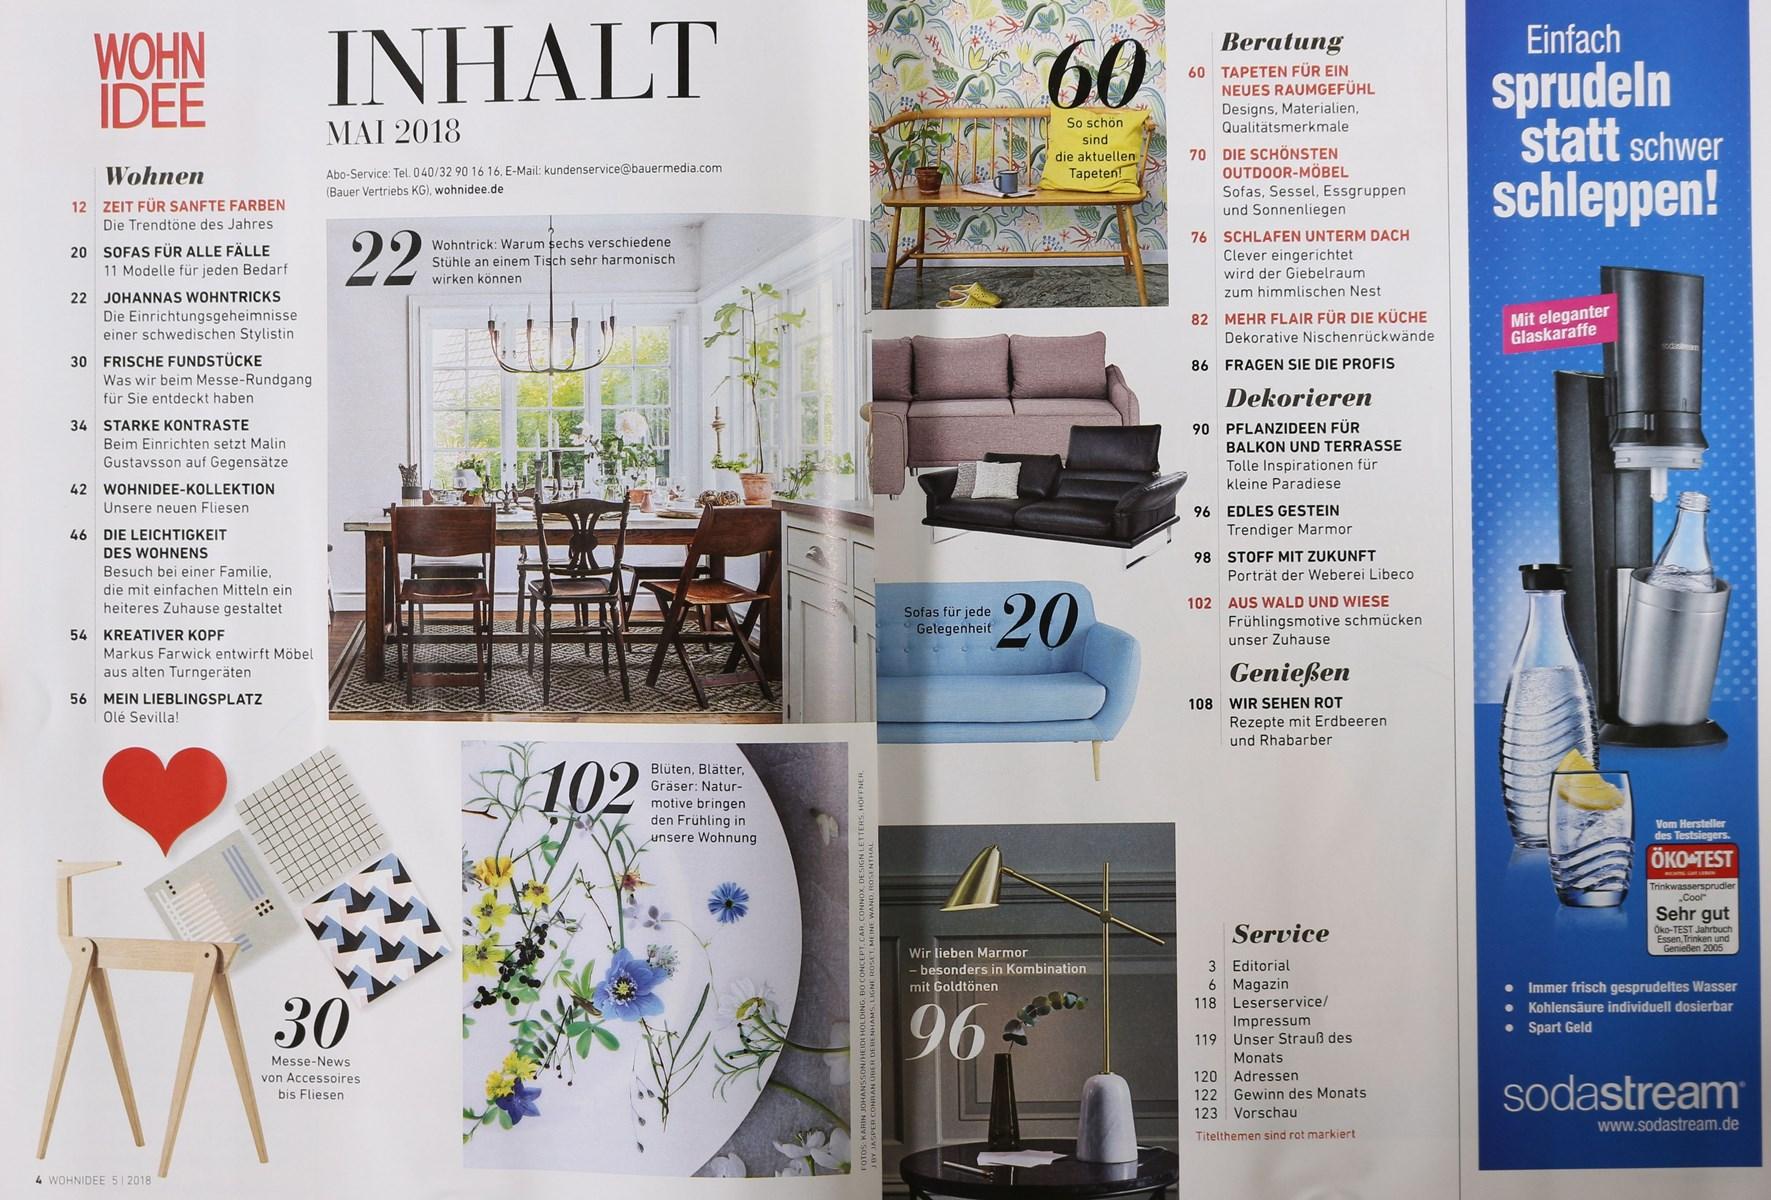 wohnidee abo beautiful wohnidee abo trendy homes u. Black Bedroom Furniture Sets. Home Design Ideas